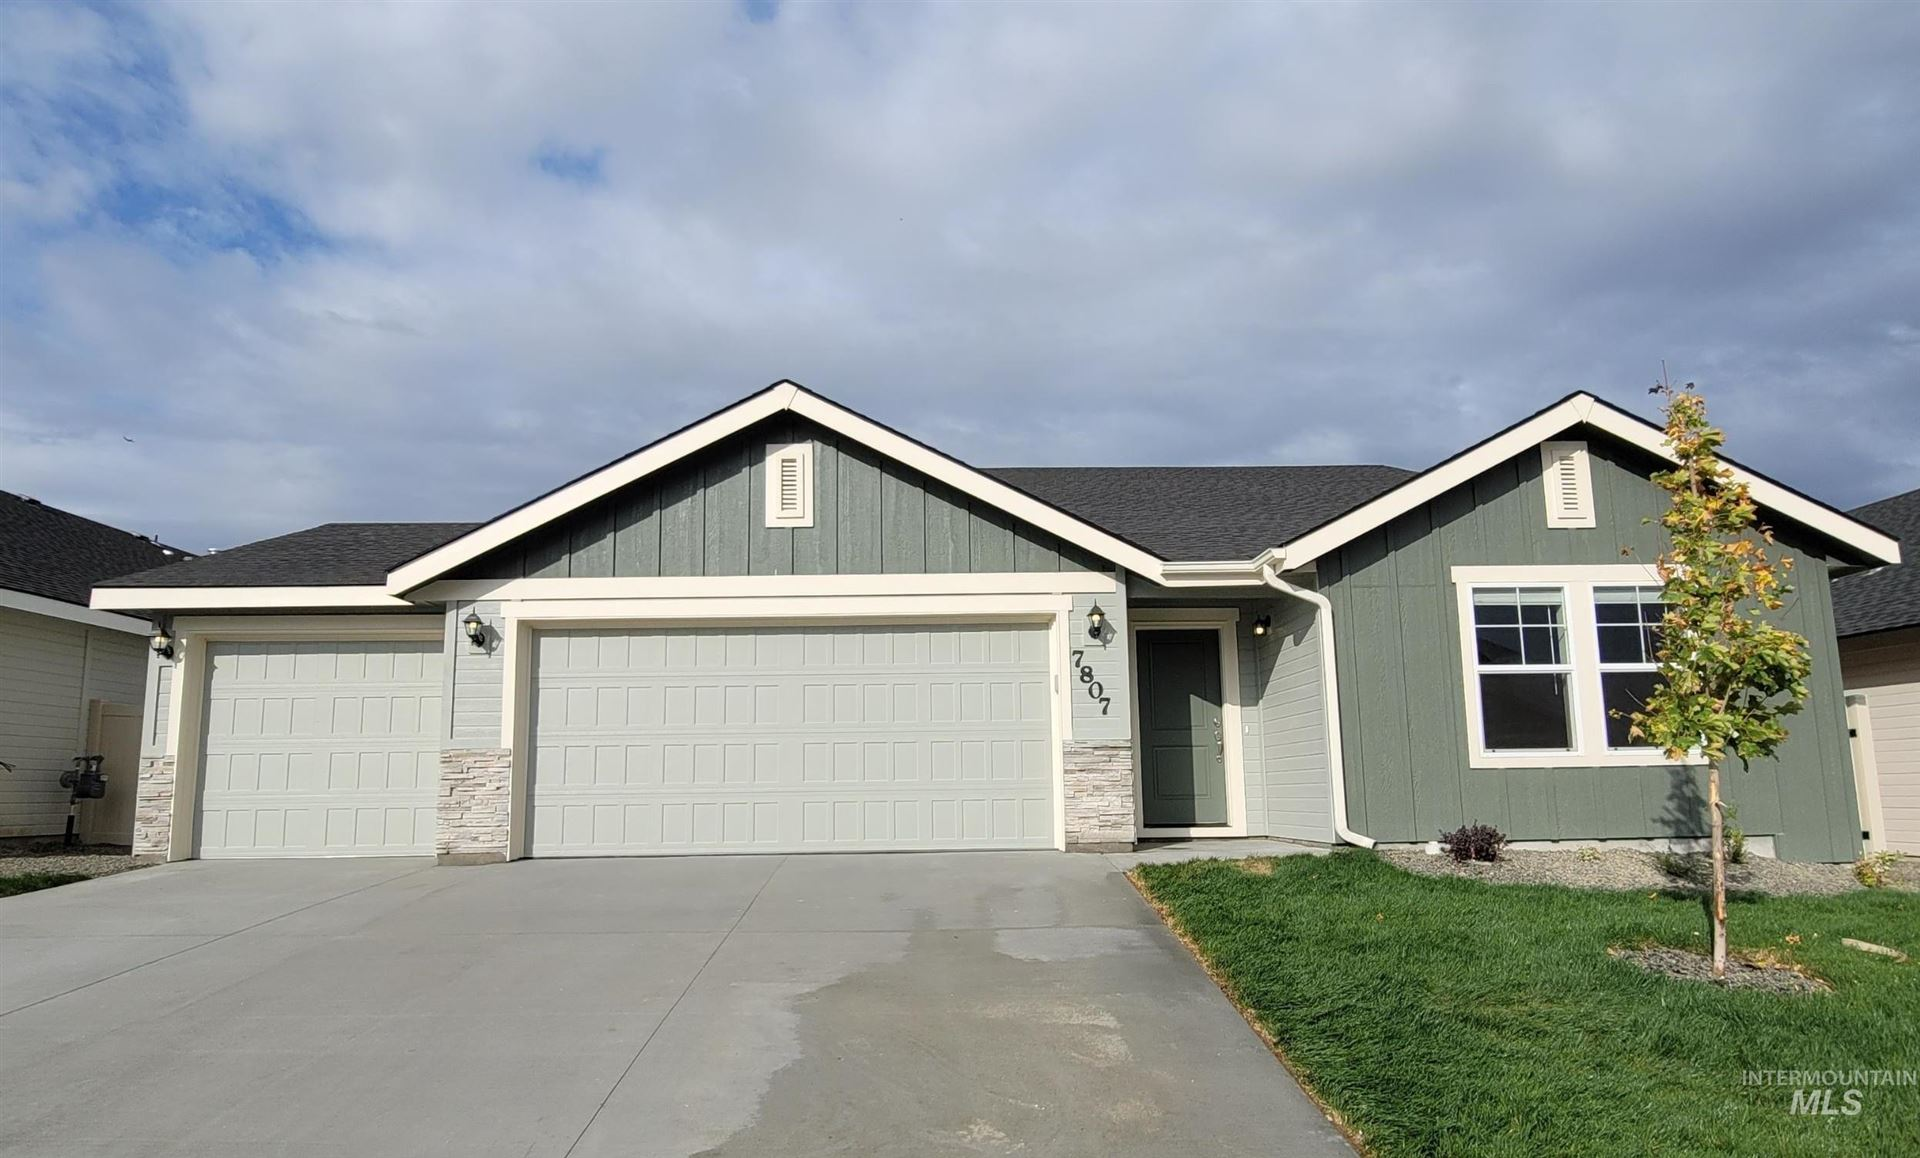 7807 S Dewberry Ave., Boise, ID 83709 - MLS#: 98812725